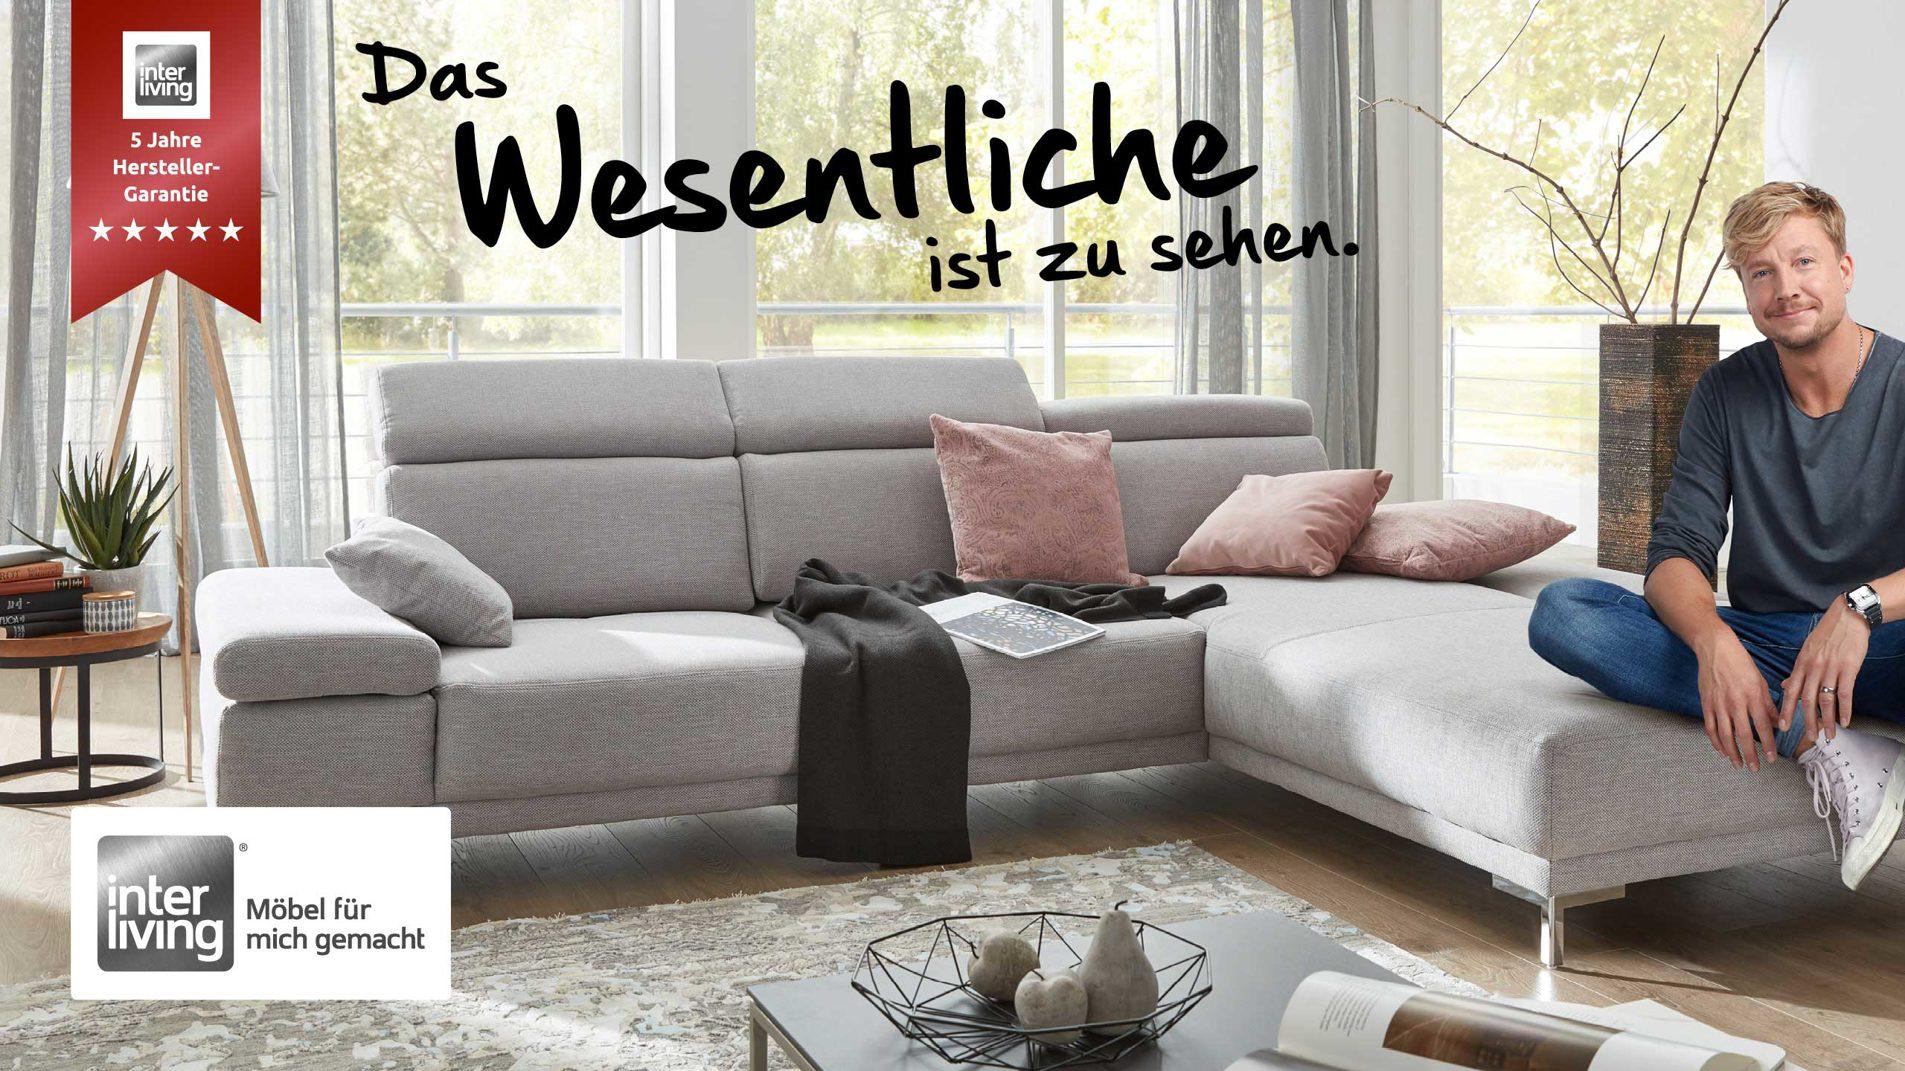 Full Size of Hertel Mbel Ek Gesees Wohnzimmer Moebel.de